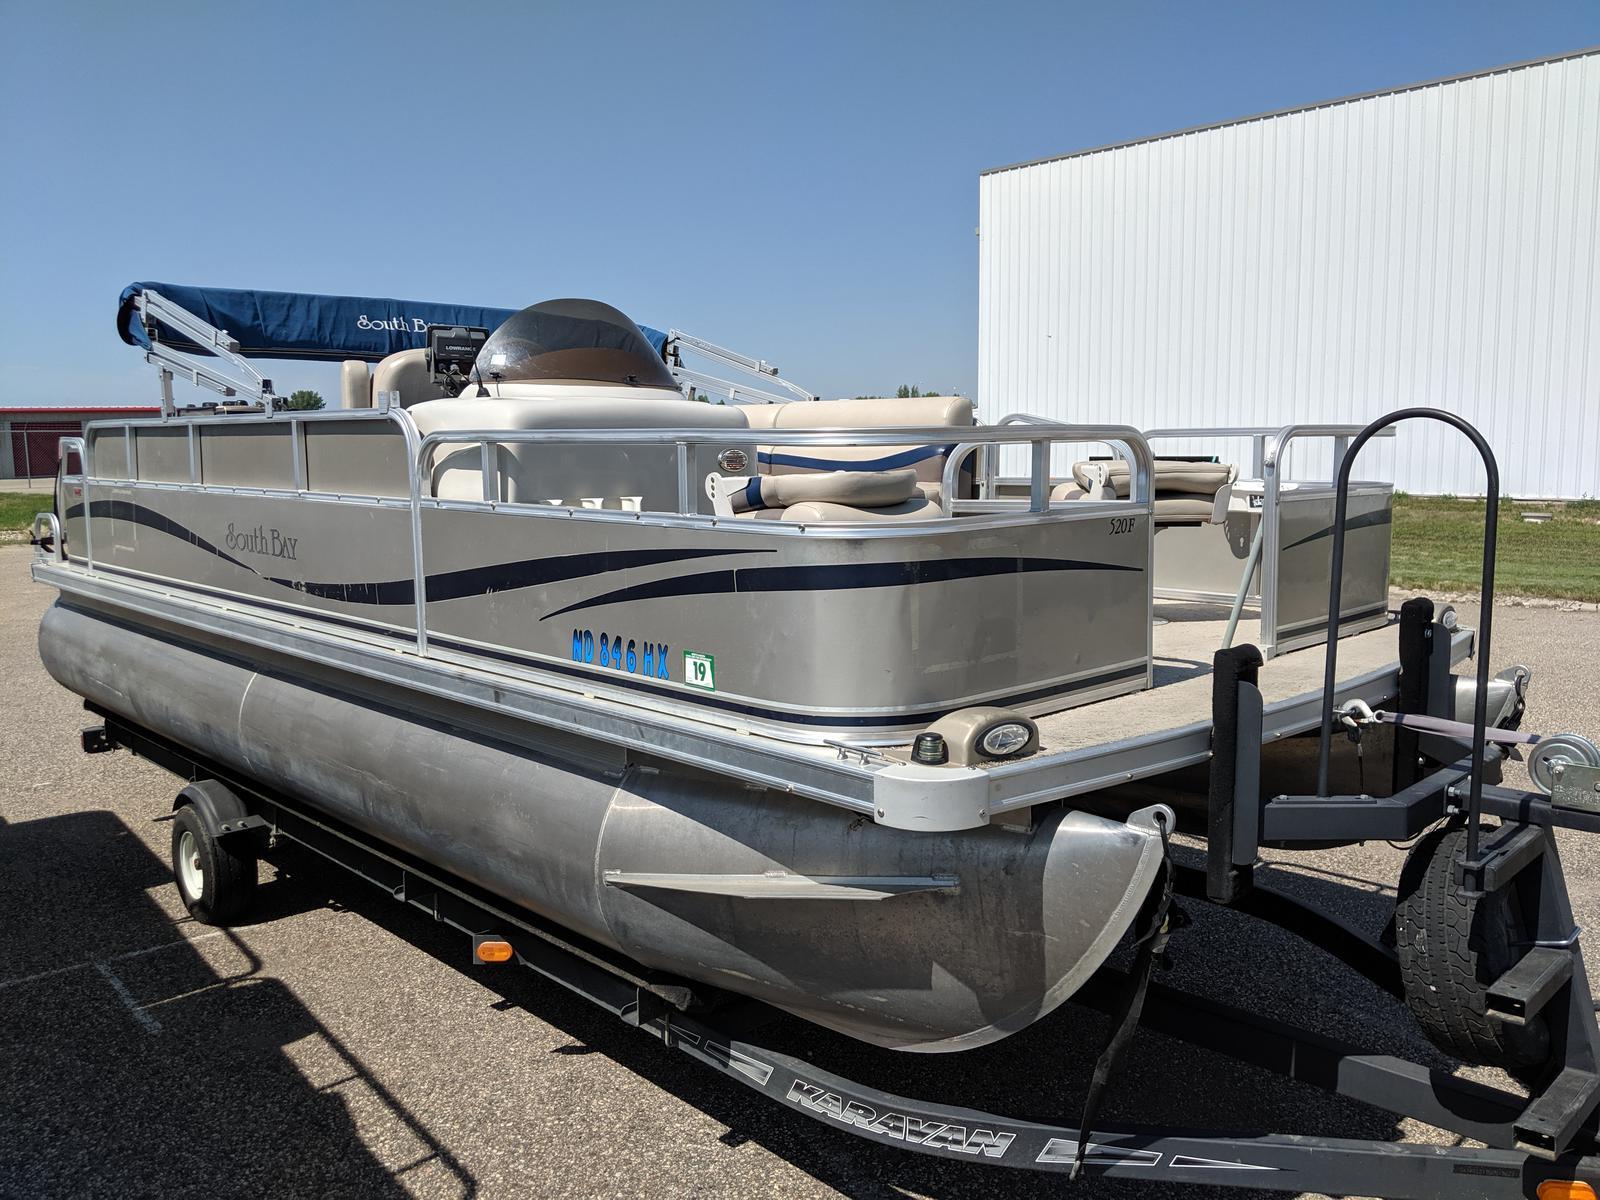 2010 South Bay 520F